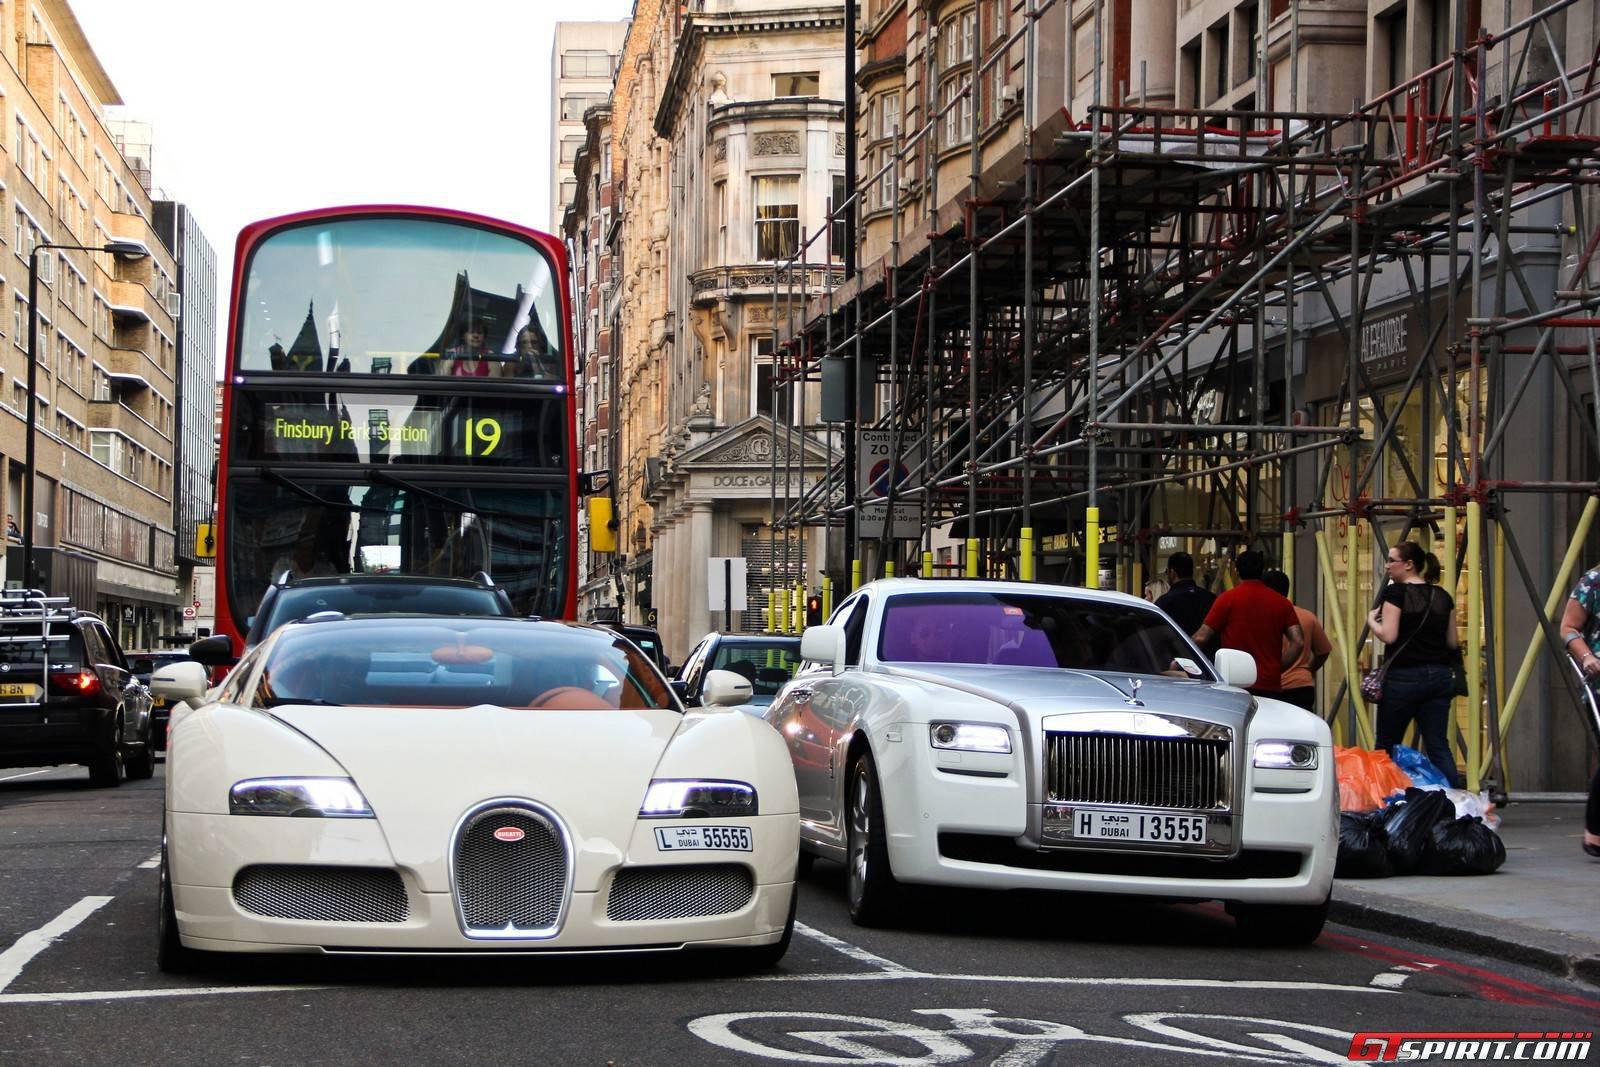 Gallery Supercars Season In London By Mitch Wilschut